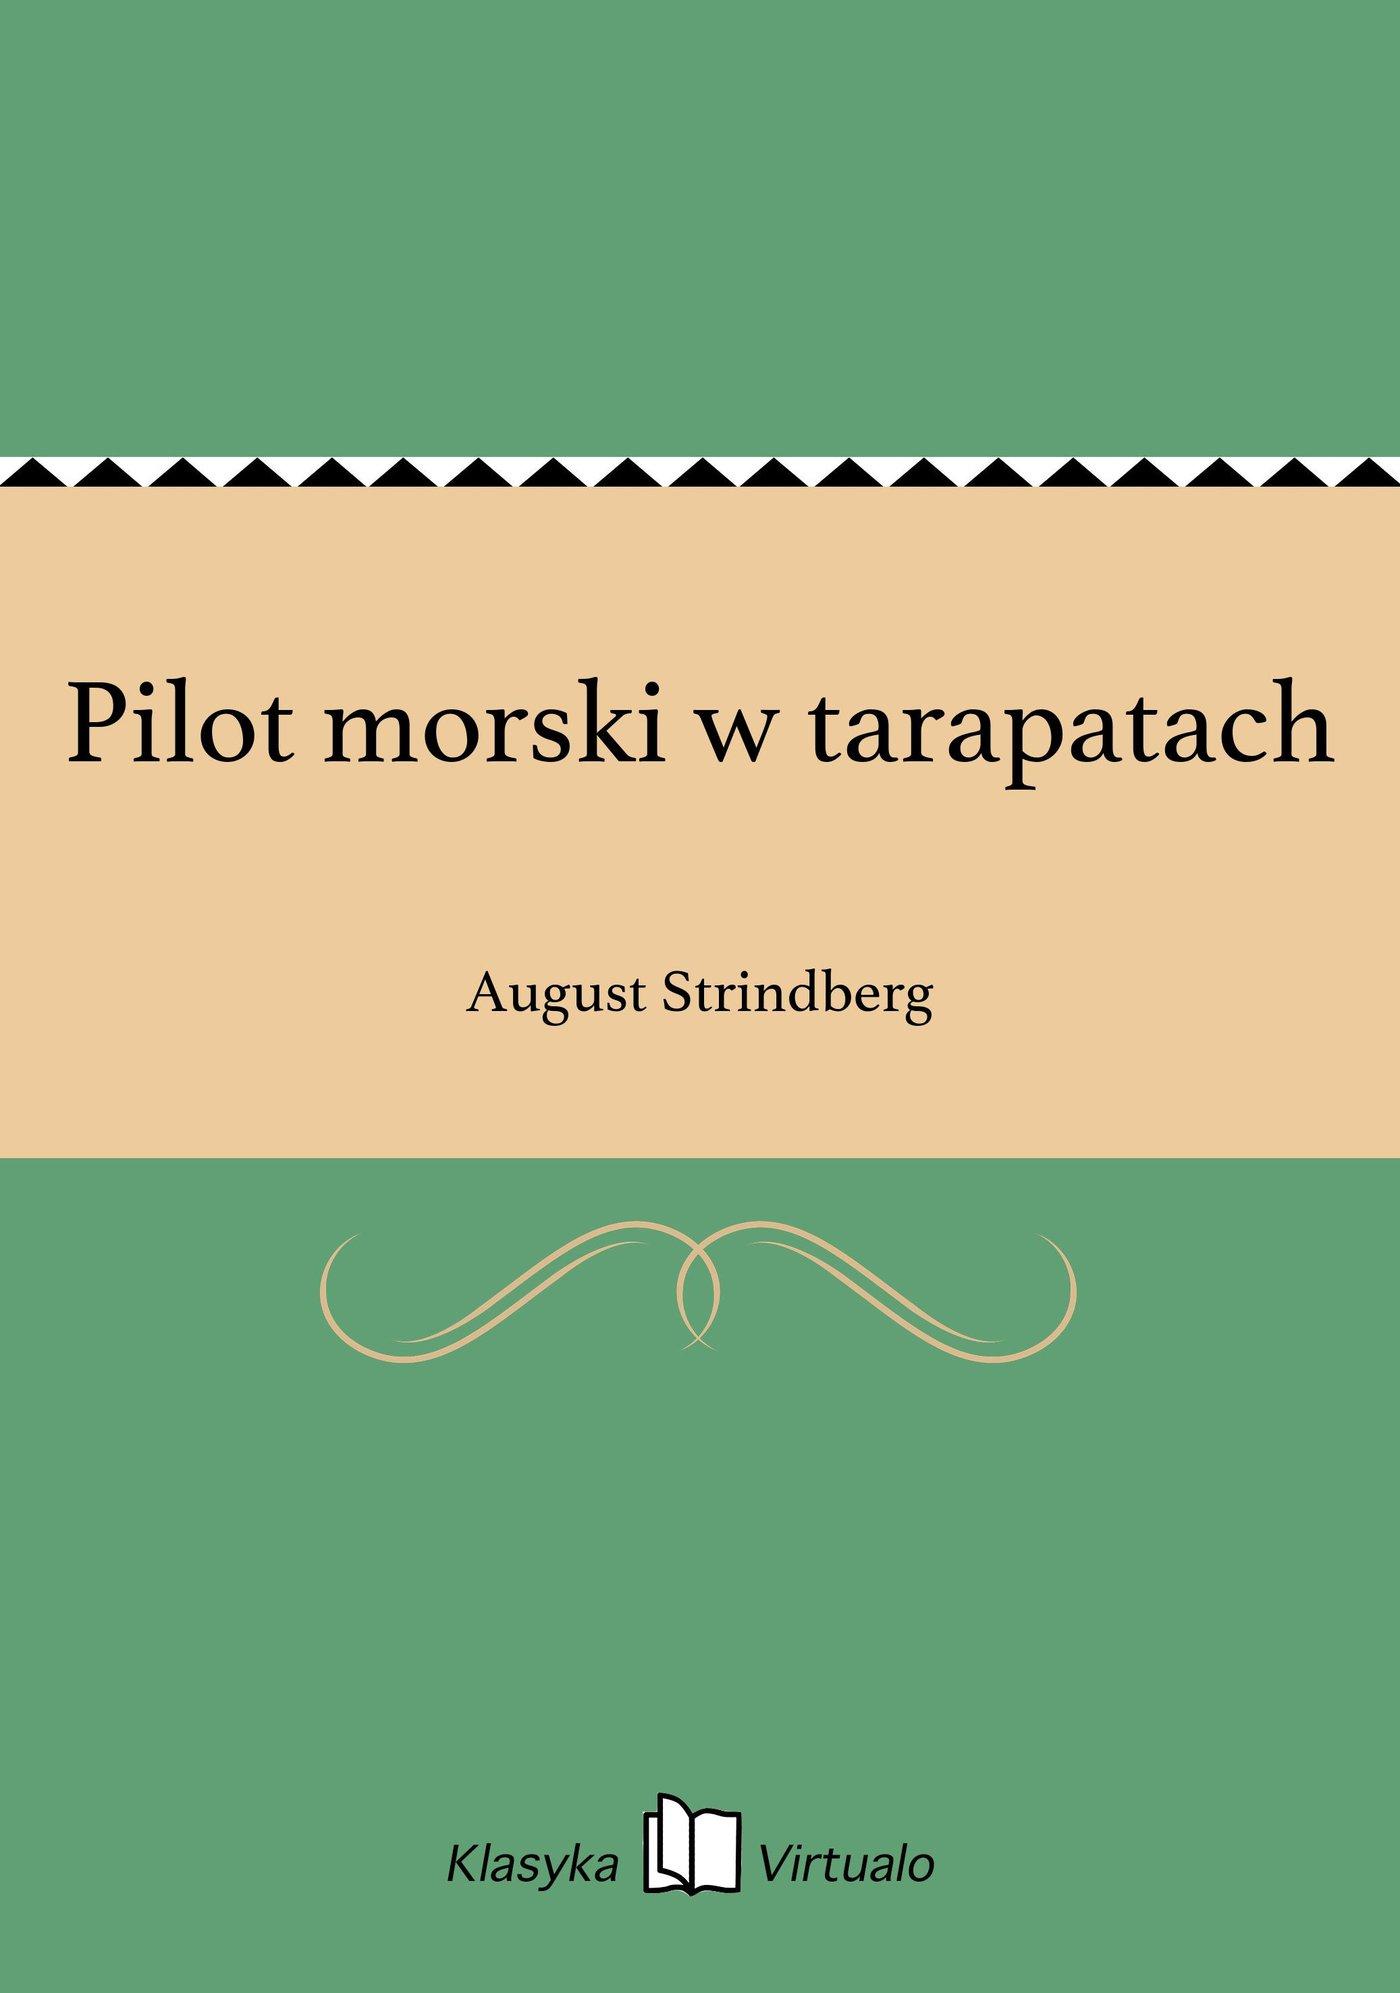 Pilot morski w tarapatach - Ebook (Książka na Kindle) do pobrania w formacie MOBI